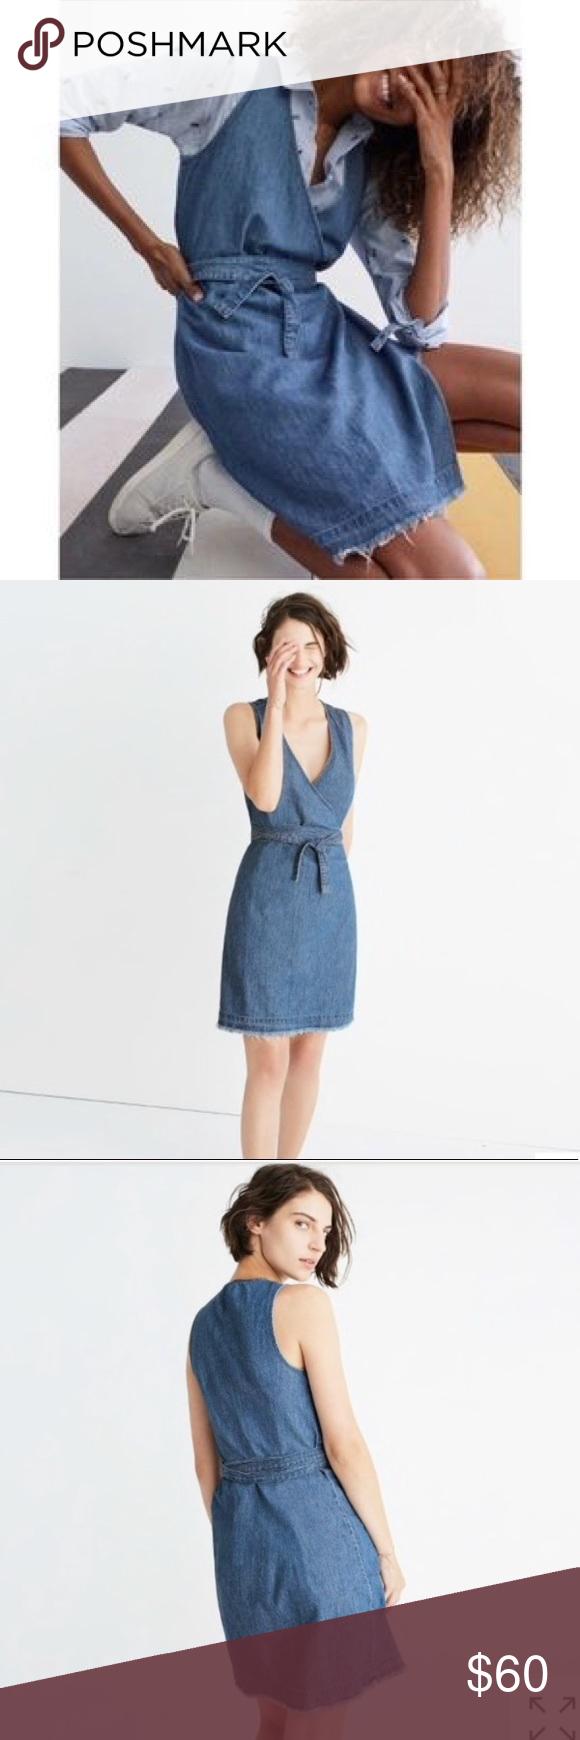 7283550fcf Madewell denim raw hem wrap dress A true-blue denim take on a timeless wrap  dress. Frayed edges give it a turned-it-into-a-mini-yourself vibe.